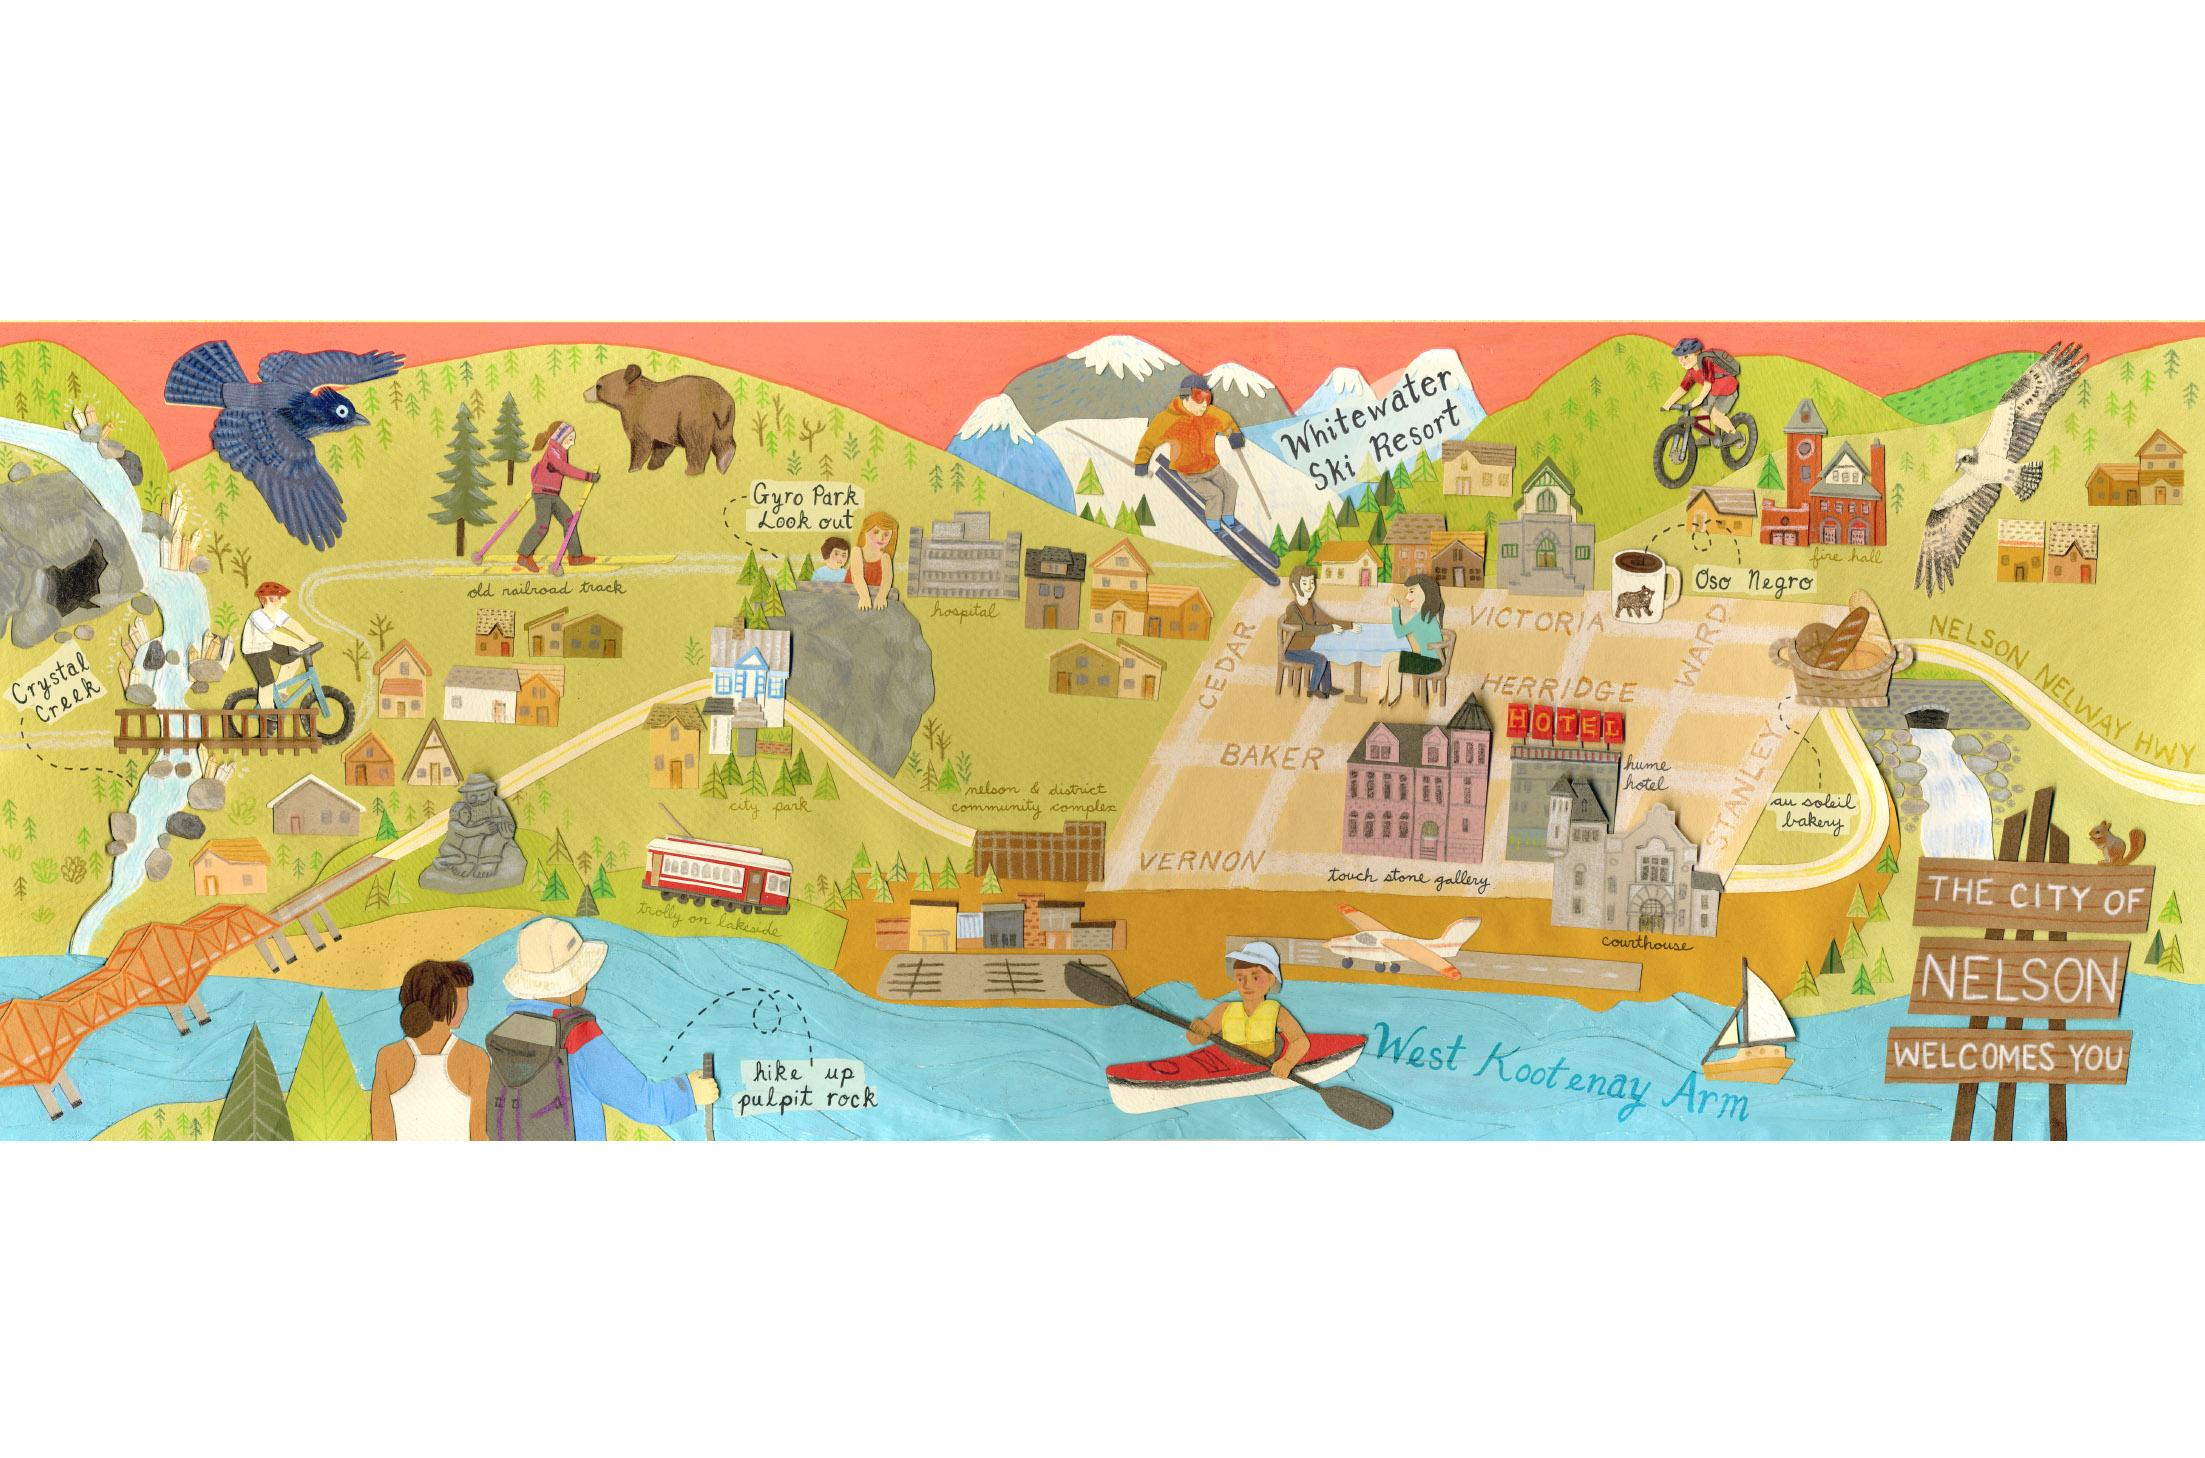 nelson_british_columbia_city_illustrated_map.jpg